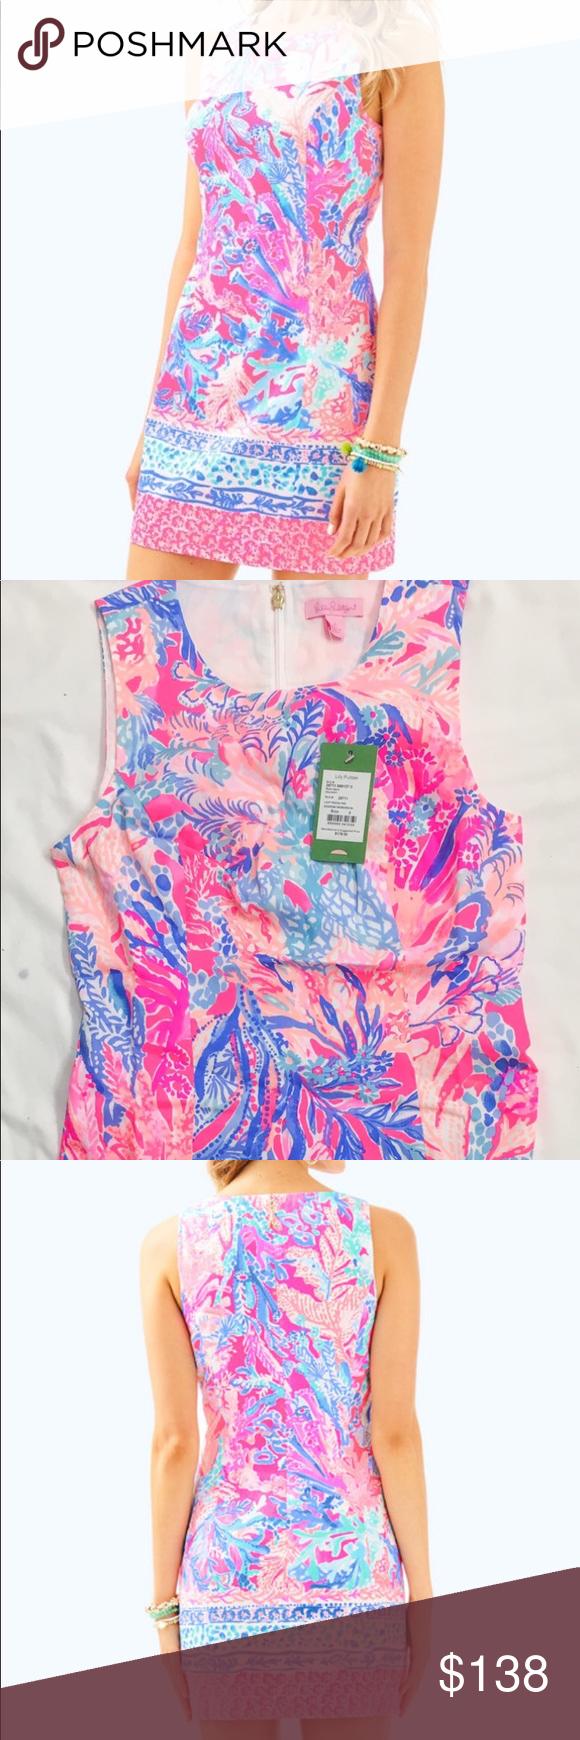 e174182434c5e8 LILLY PULITZER Mila Shift Dress 4 Pink Aquadesiac NEW LILLY PULITZER Mila  Shift Dress 4 Light